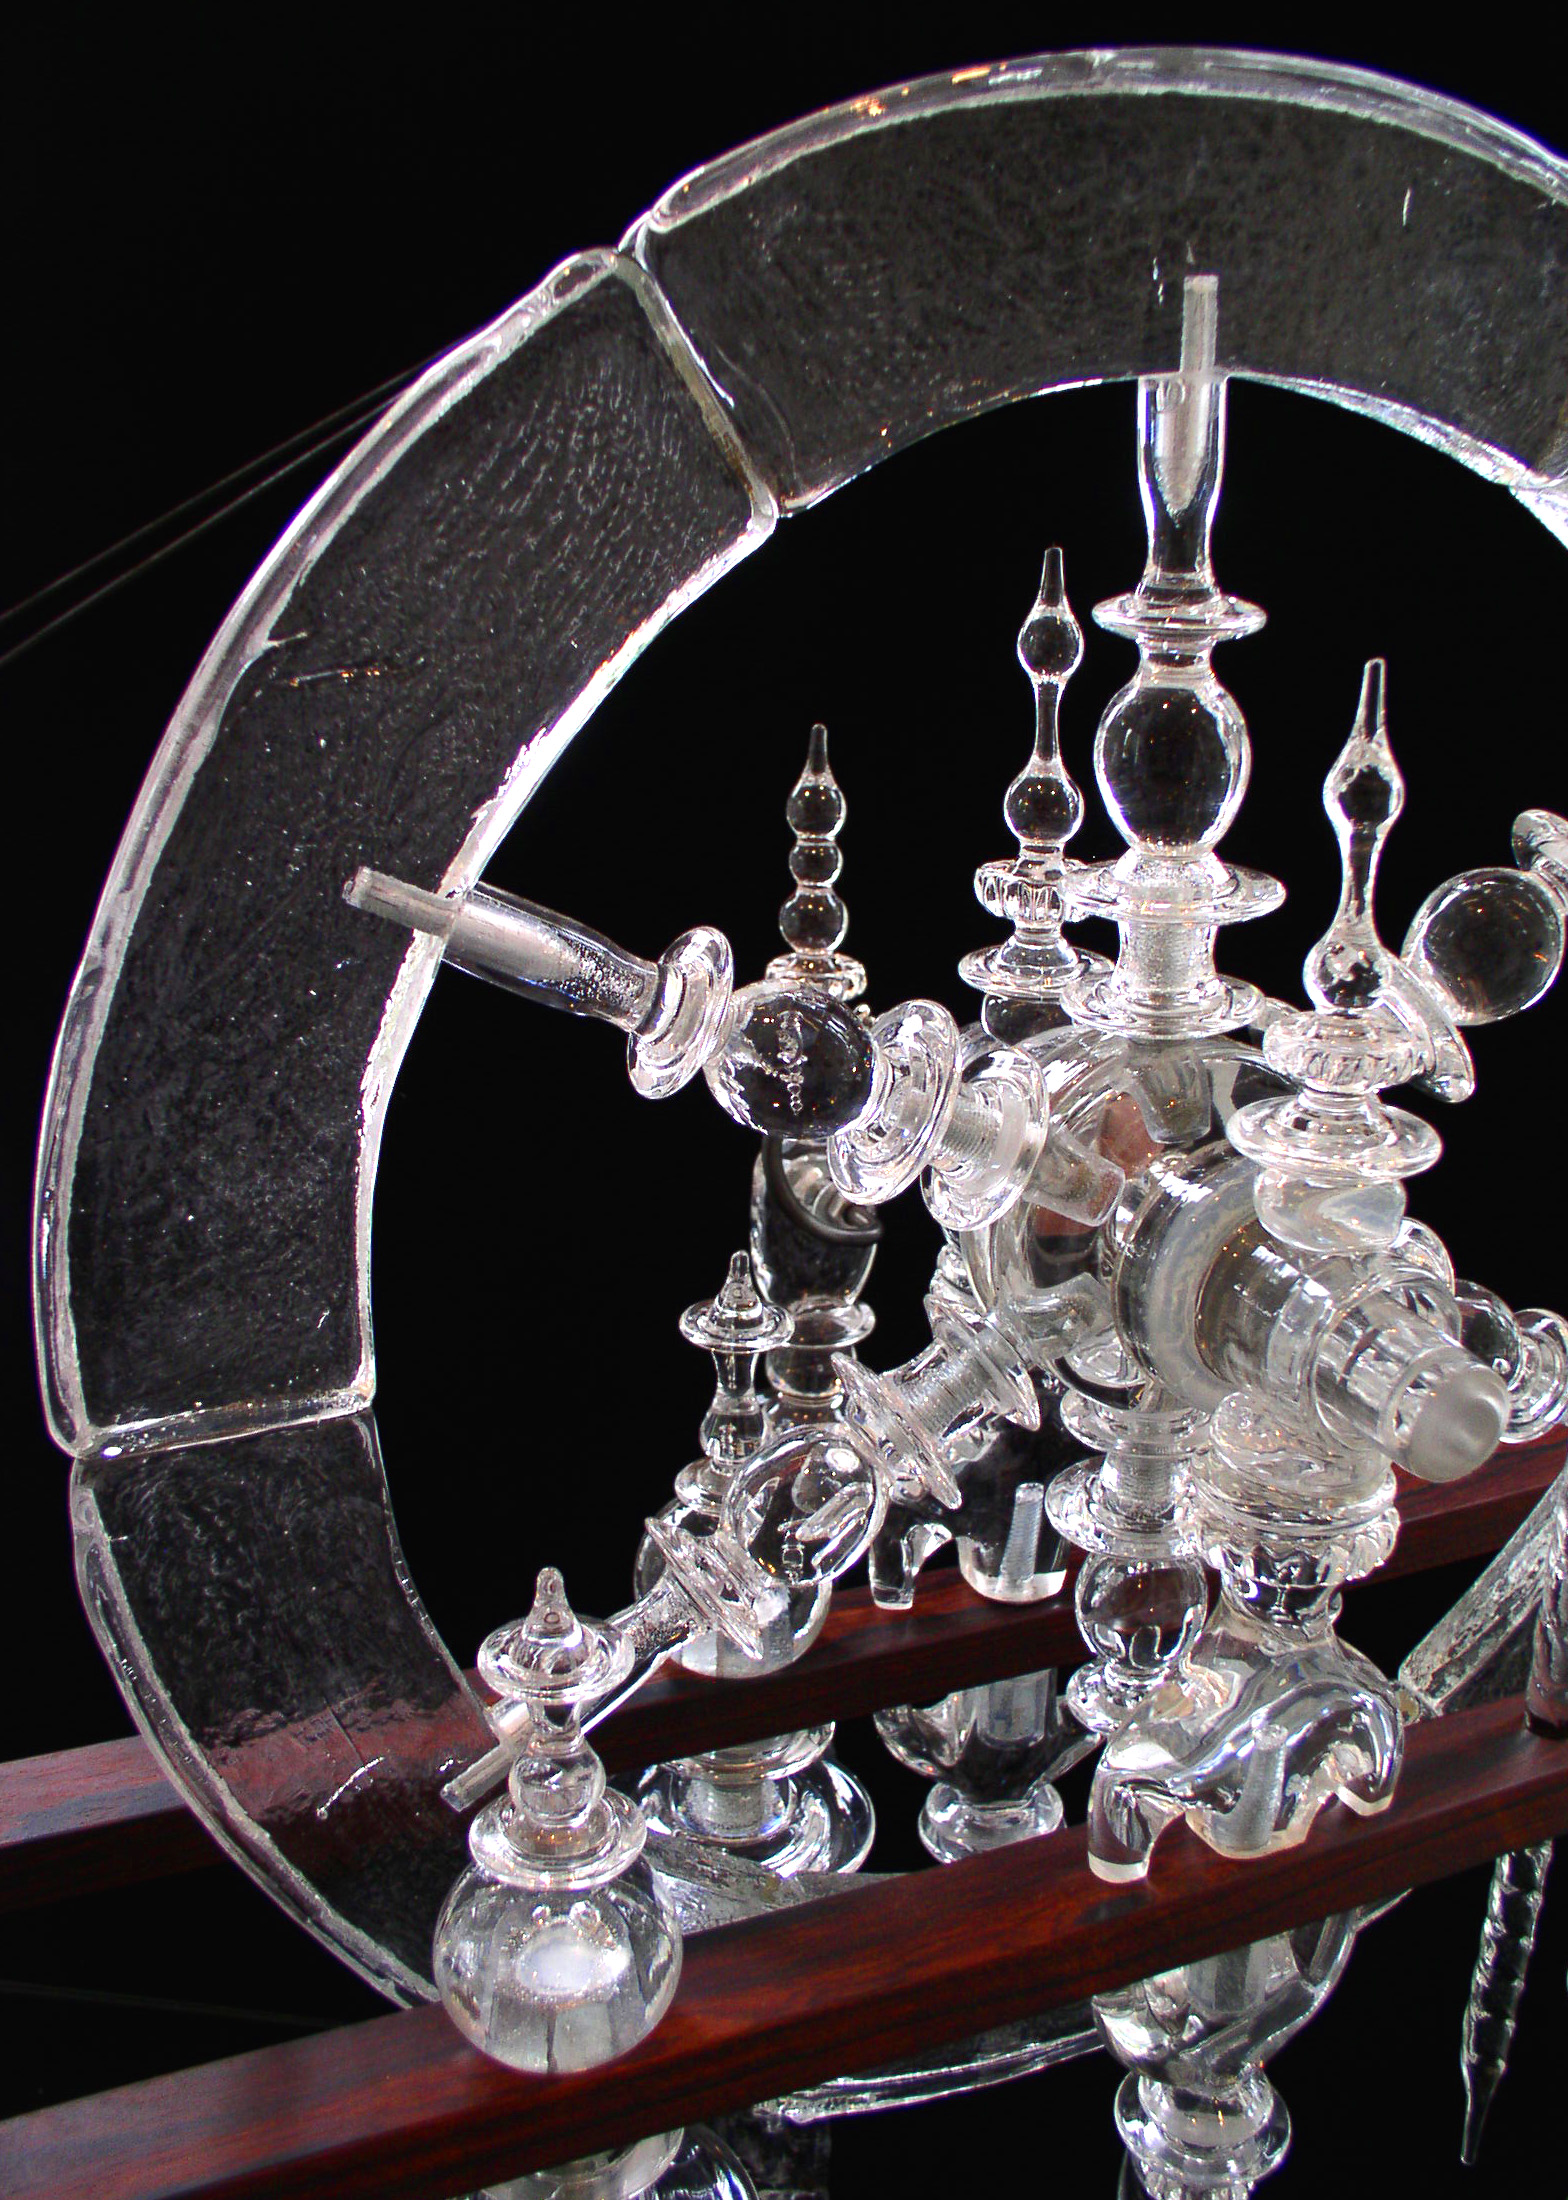 andy-paiko-spinning-wheel3.jpg